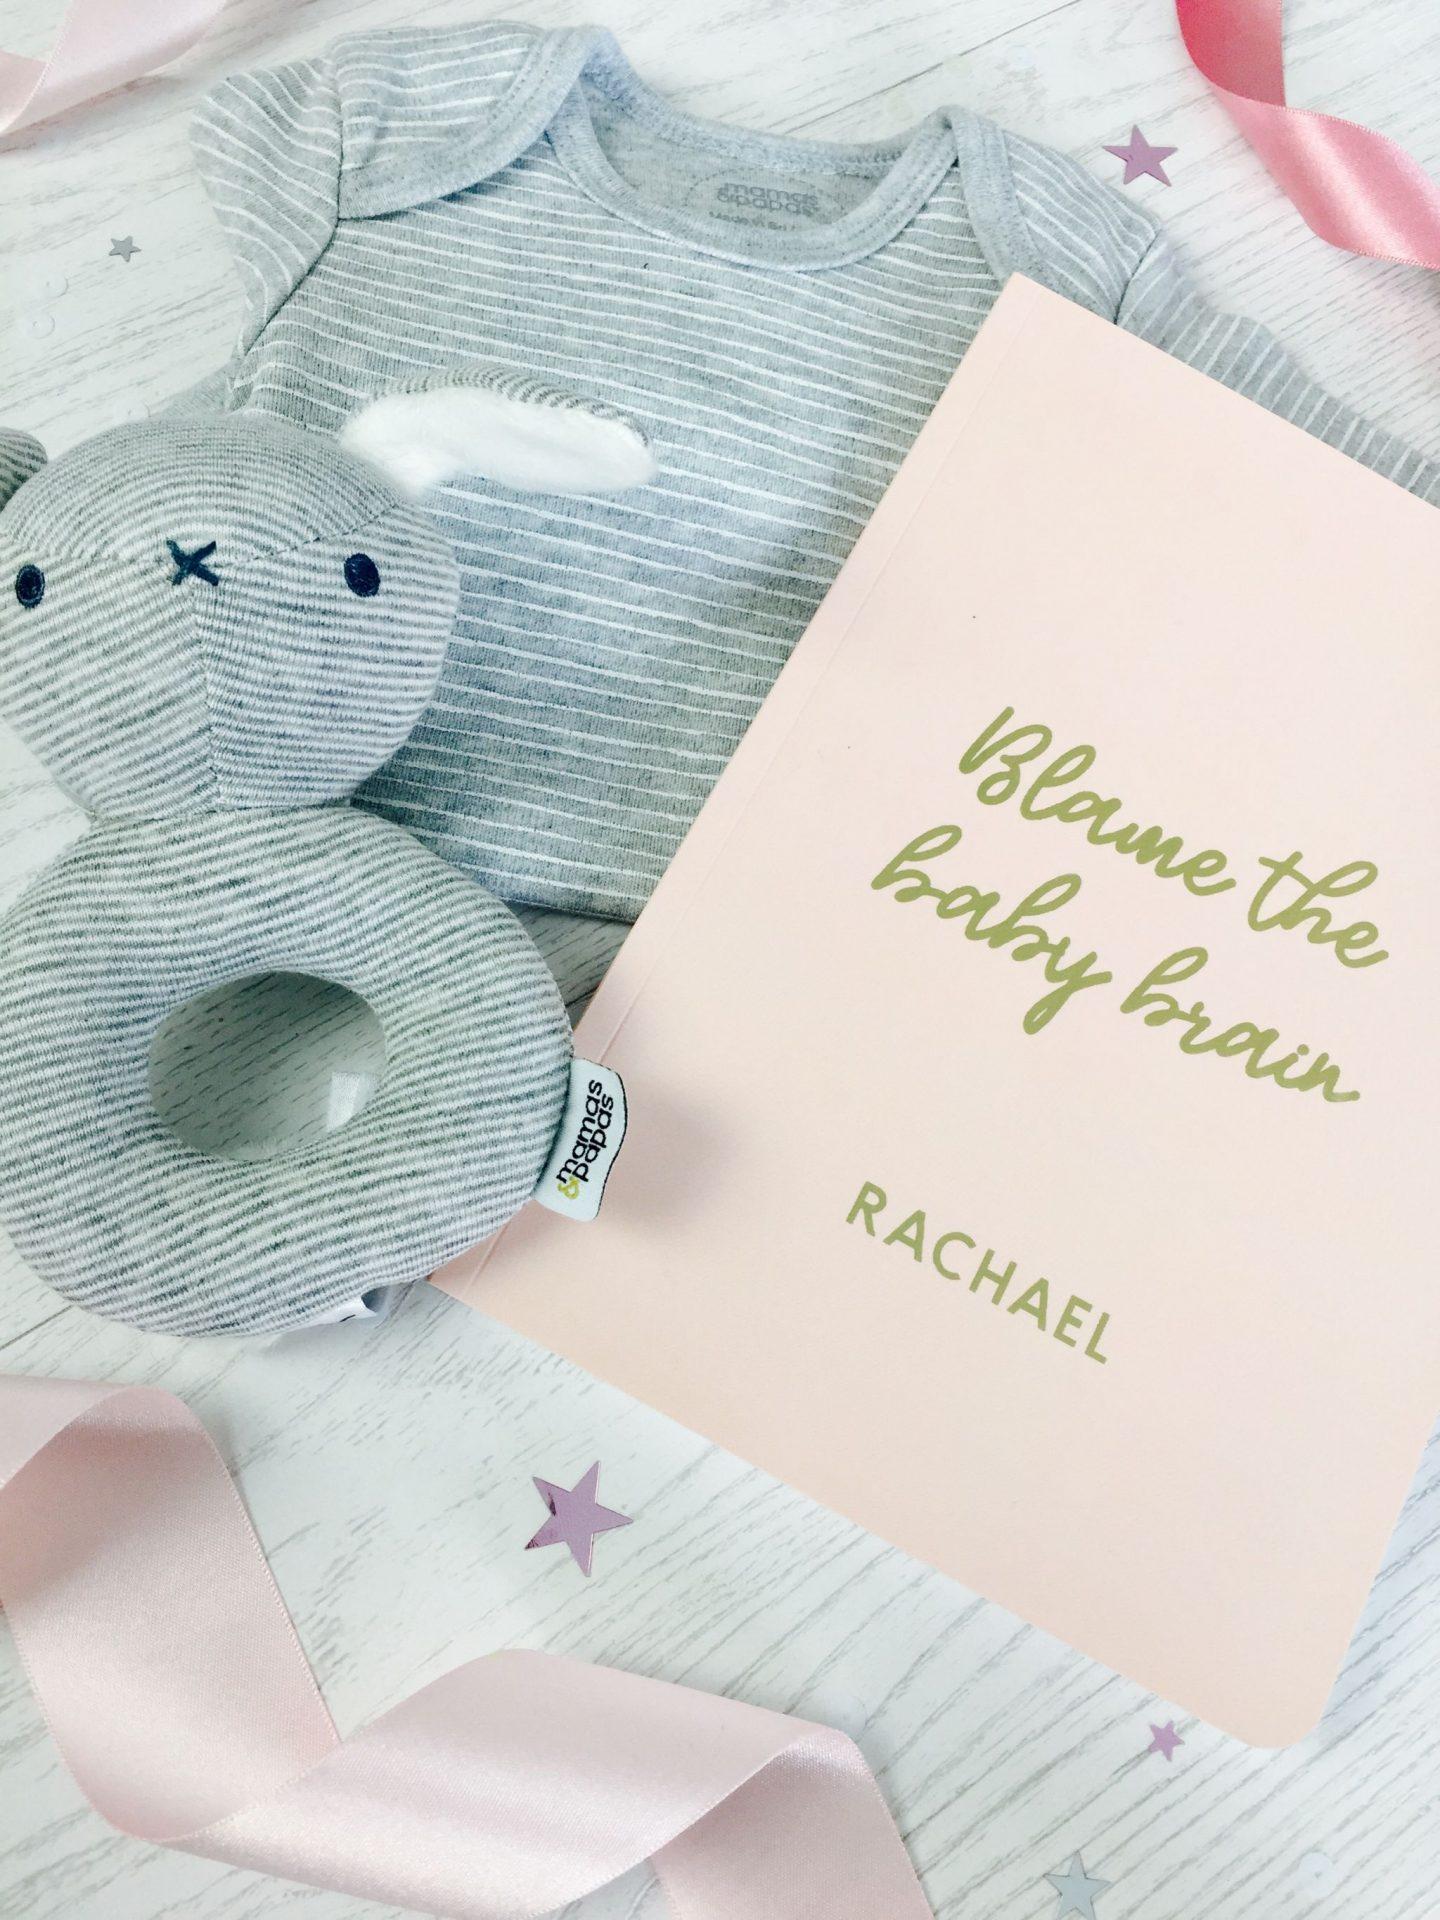 13 Week pregnancy update and bumpie baby bump